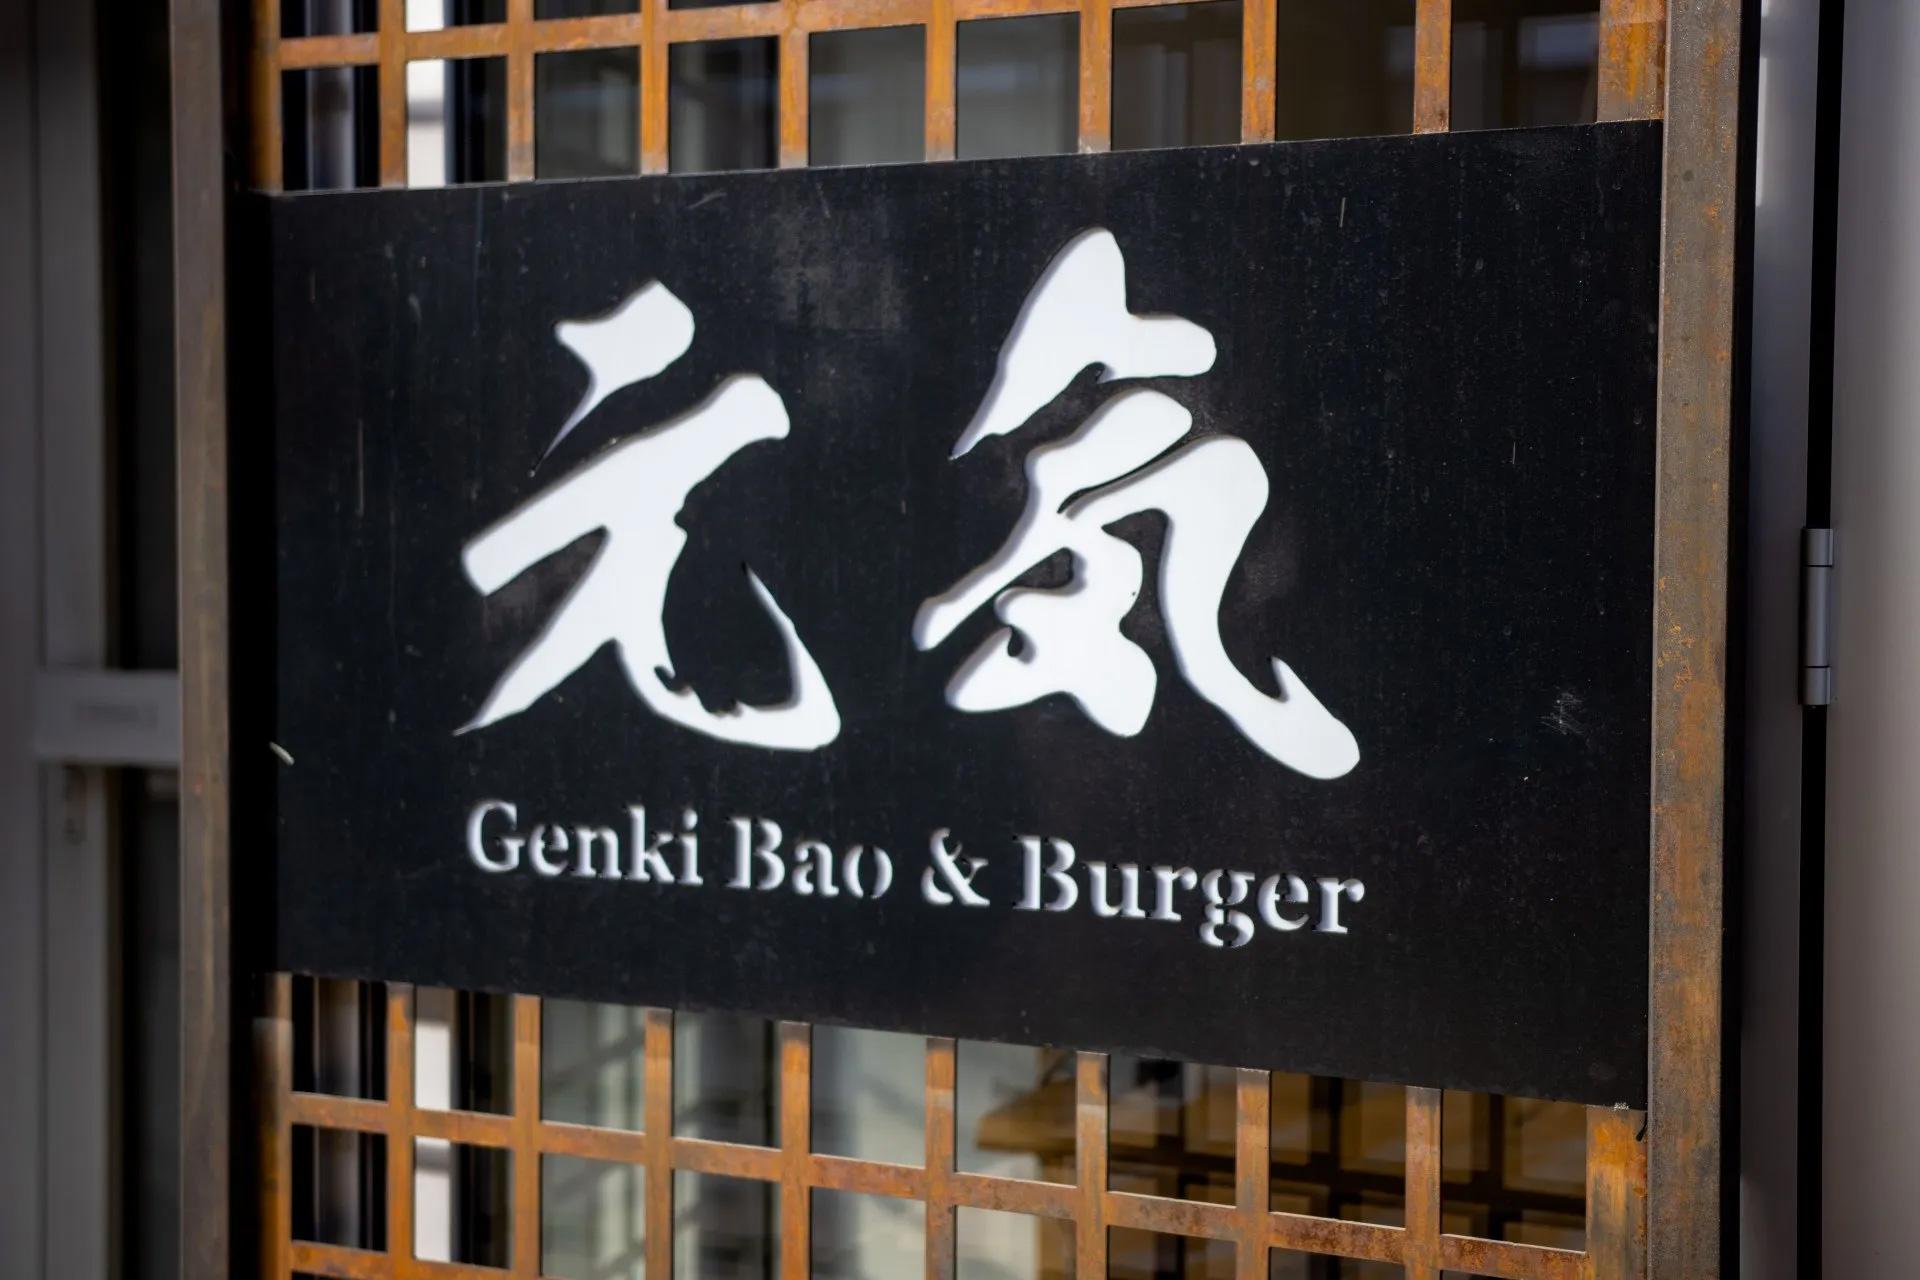 Genki Bao & Burger